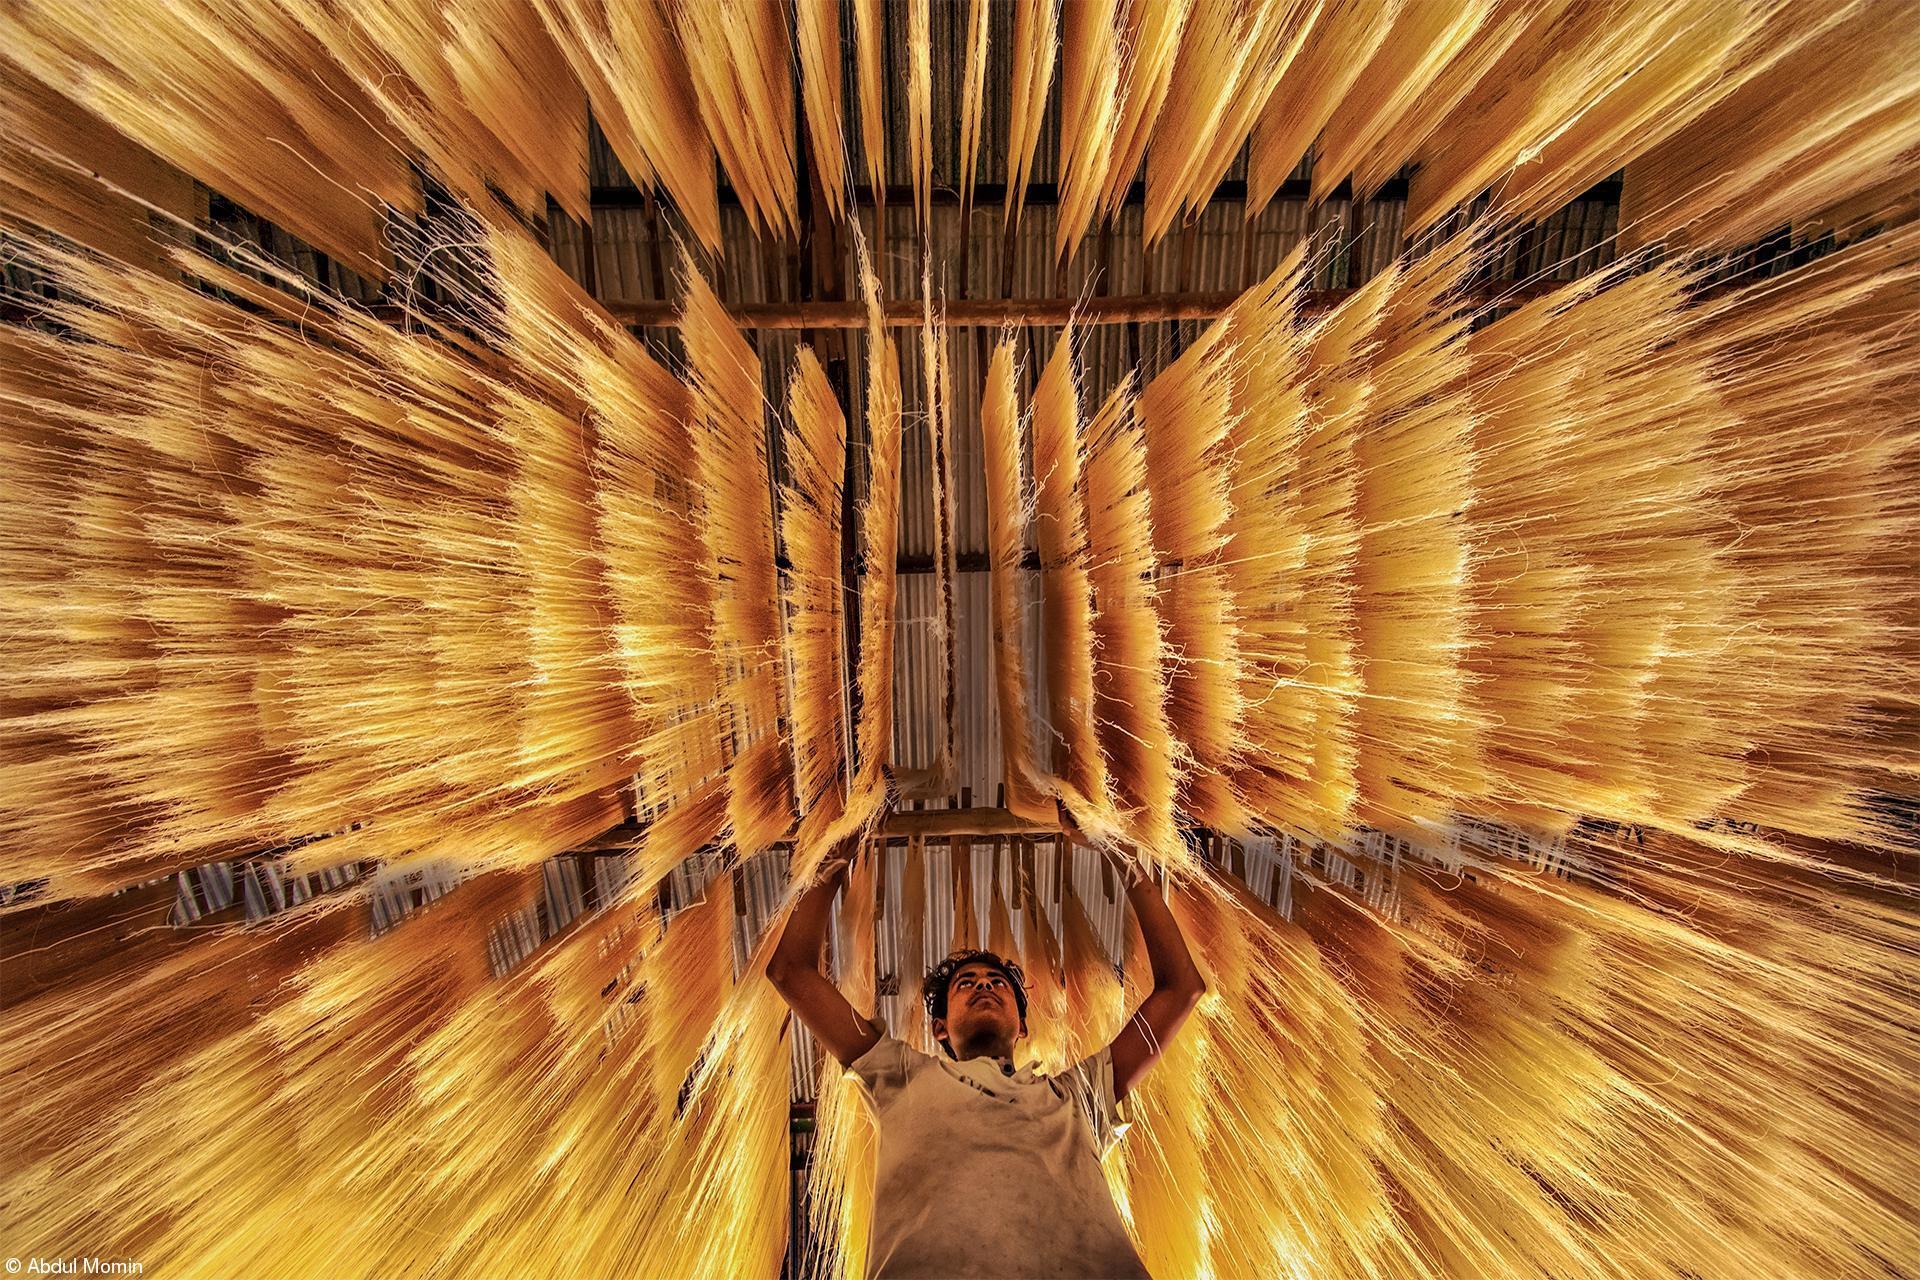 Fujifilm Award for Innovation - Abdul Momin - Making Rice Noodles